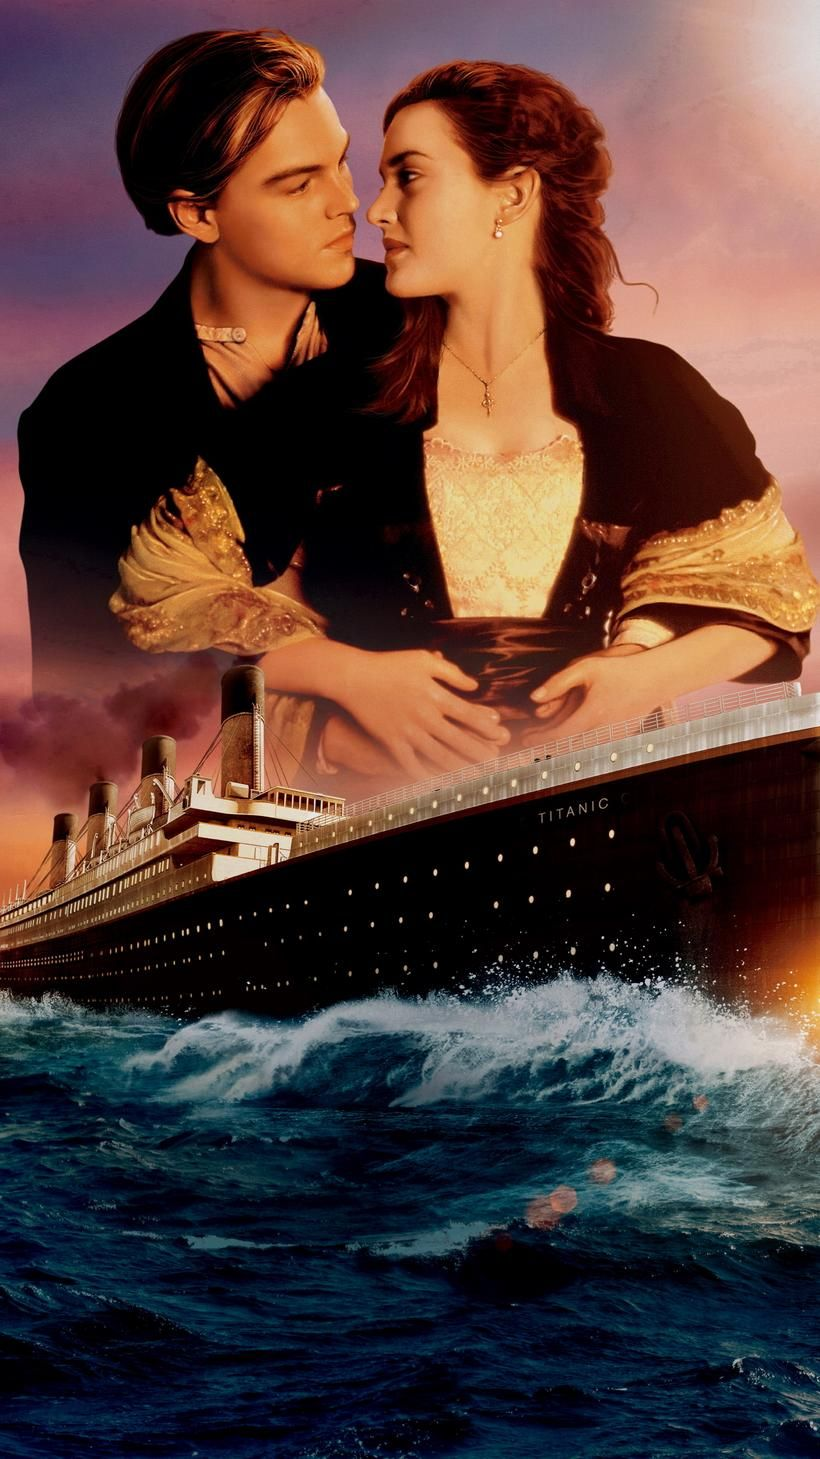 Titanic 1997 Phone Wallpaper Moviemania Titanic Movie Titanic Movie Poster Titanic